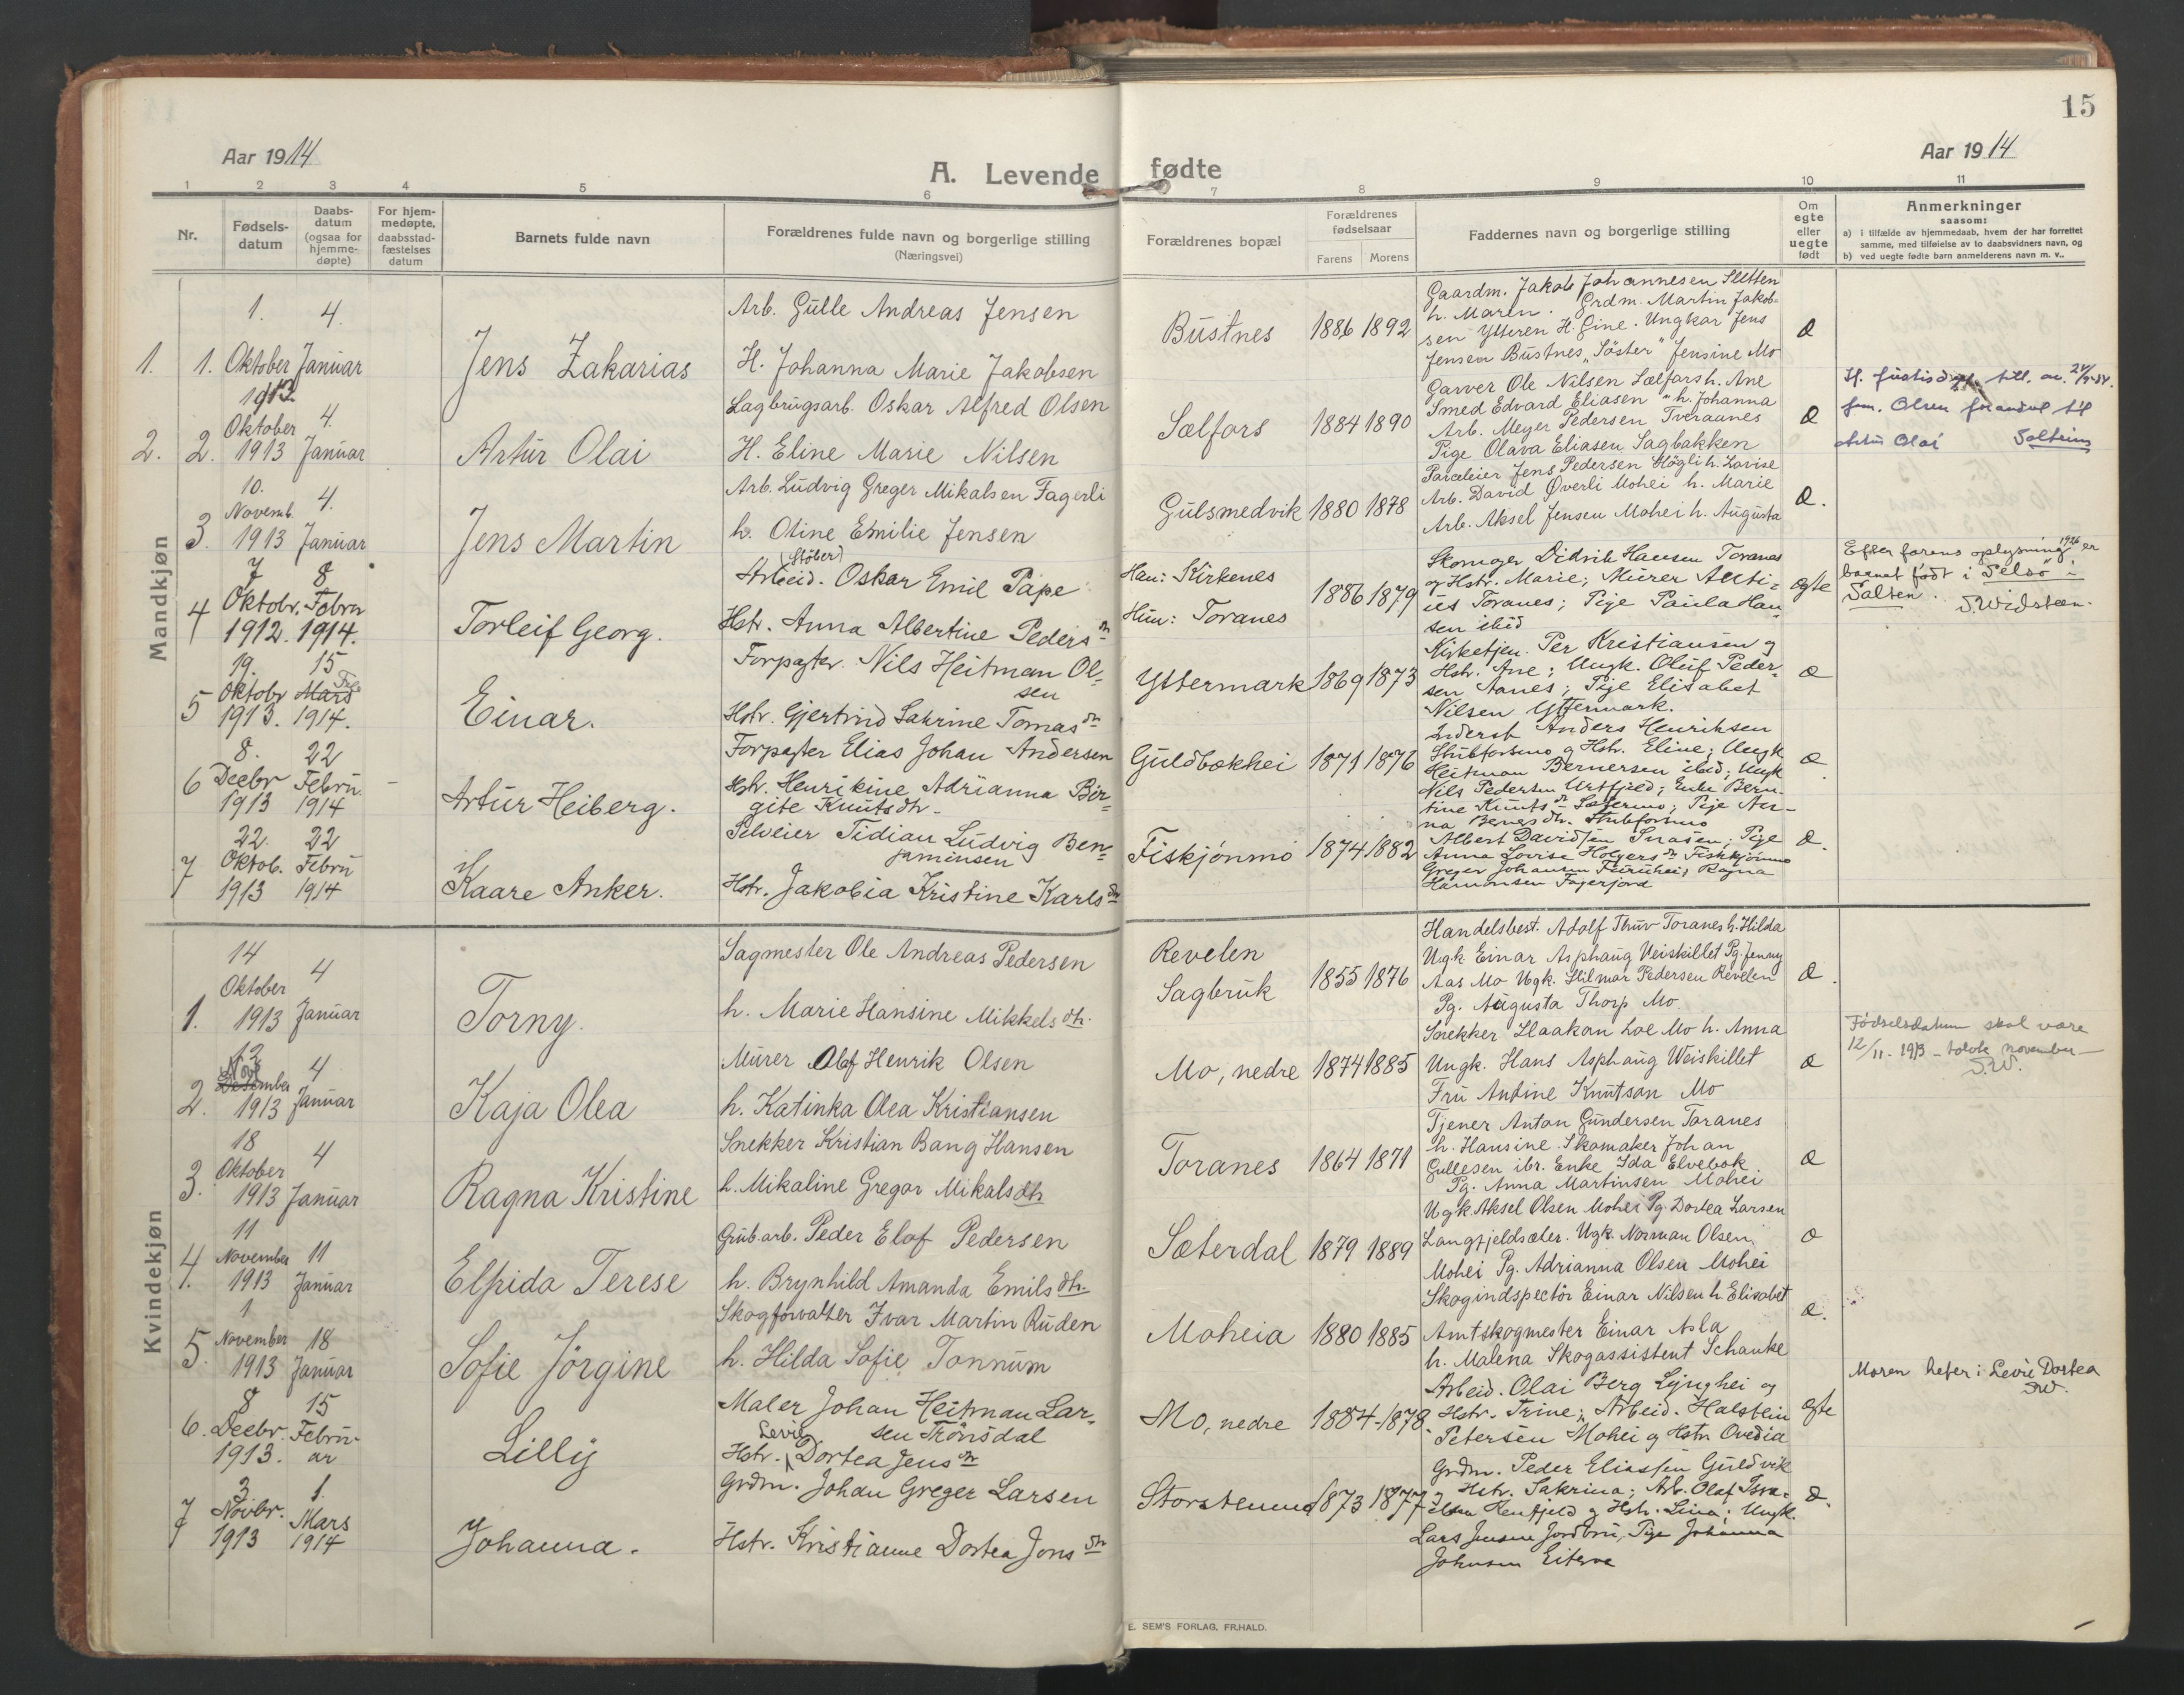 SAT, Ministerialprotokoller, klokkerbøker og fødselsregistre - Nordland, 827/L0404: Ministerialbok nr. 827A16, 1912-1925, s. 15